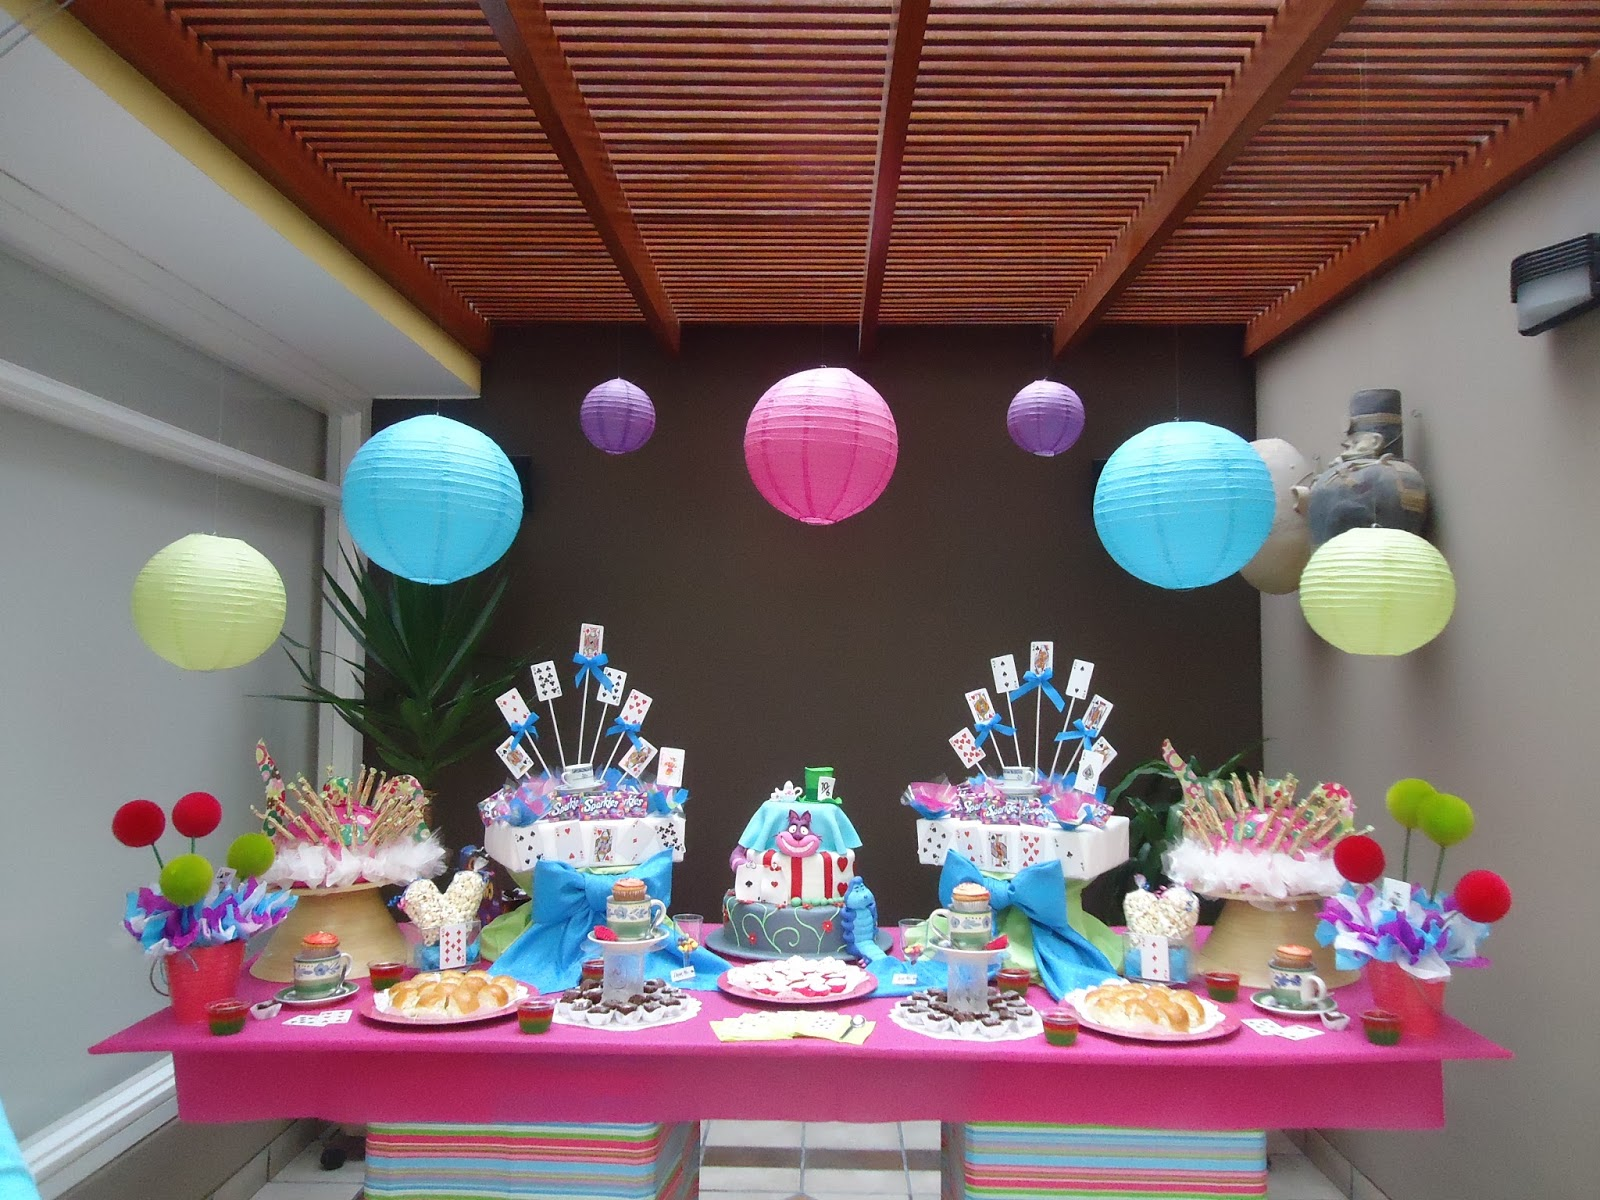 Eventos chiquilines ahora fiesta de 15 a os las chicas - Fiesta de cumpleanos para nina ...